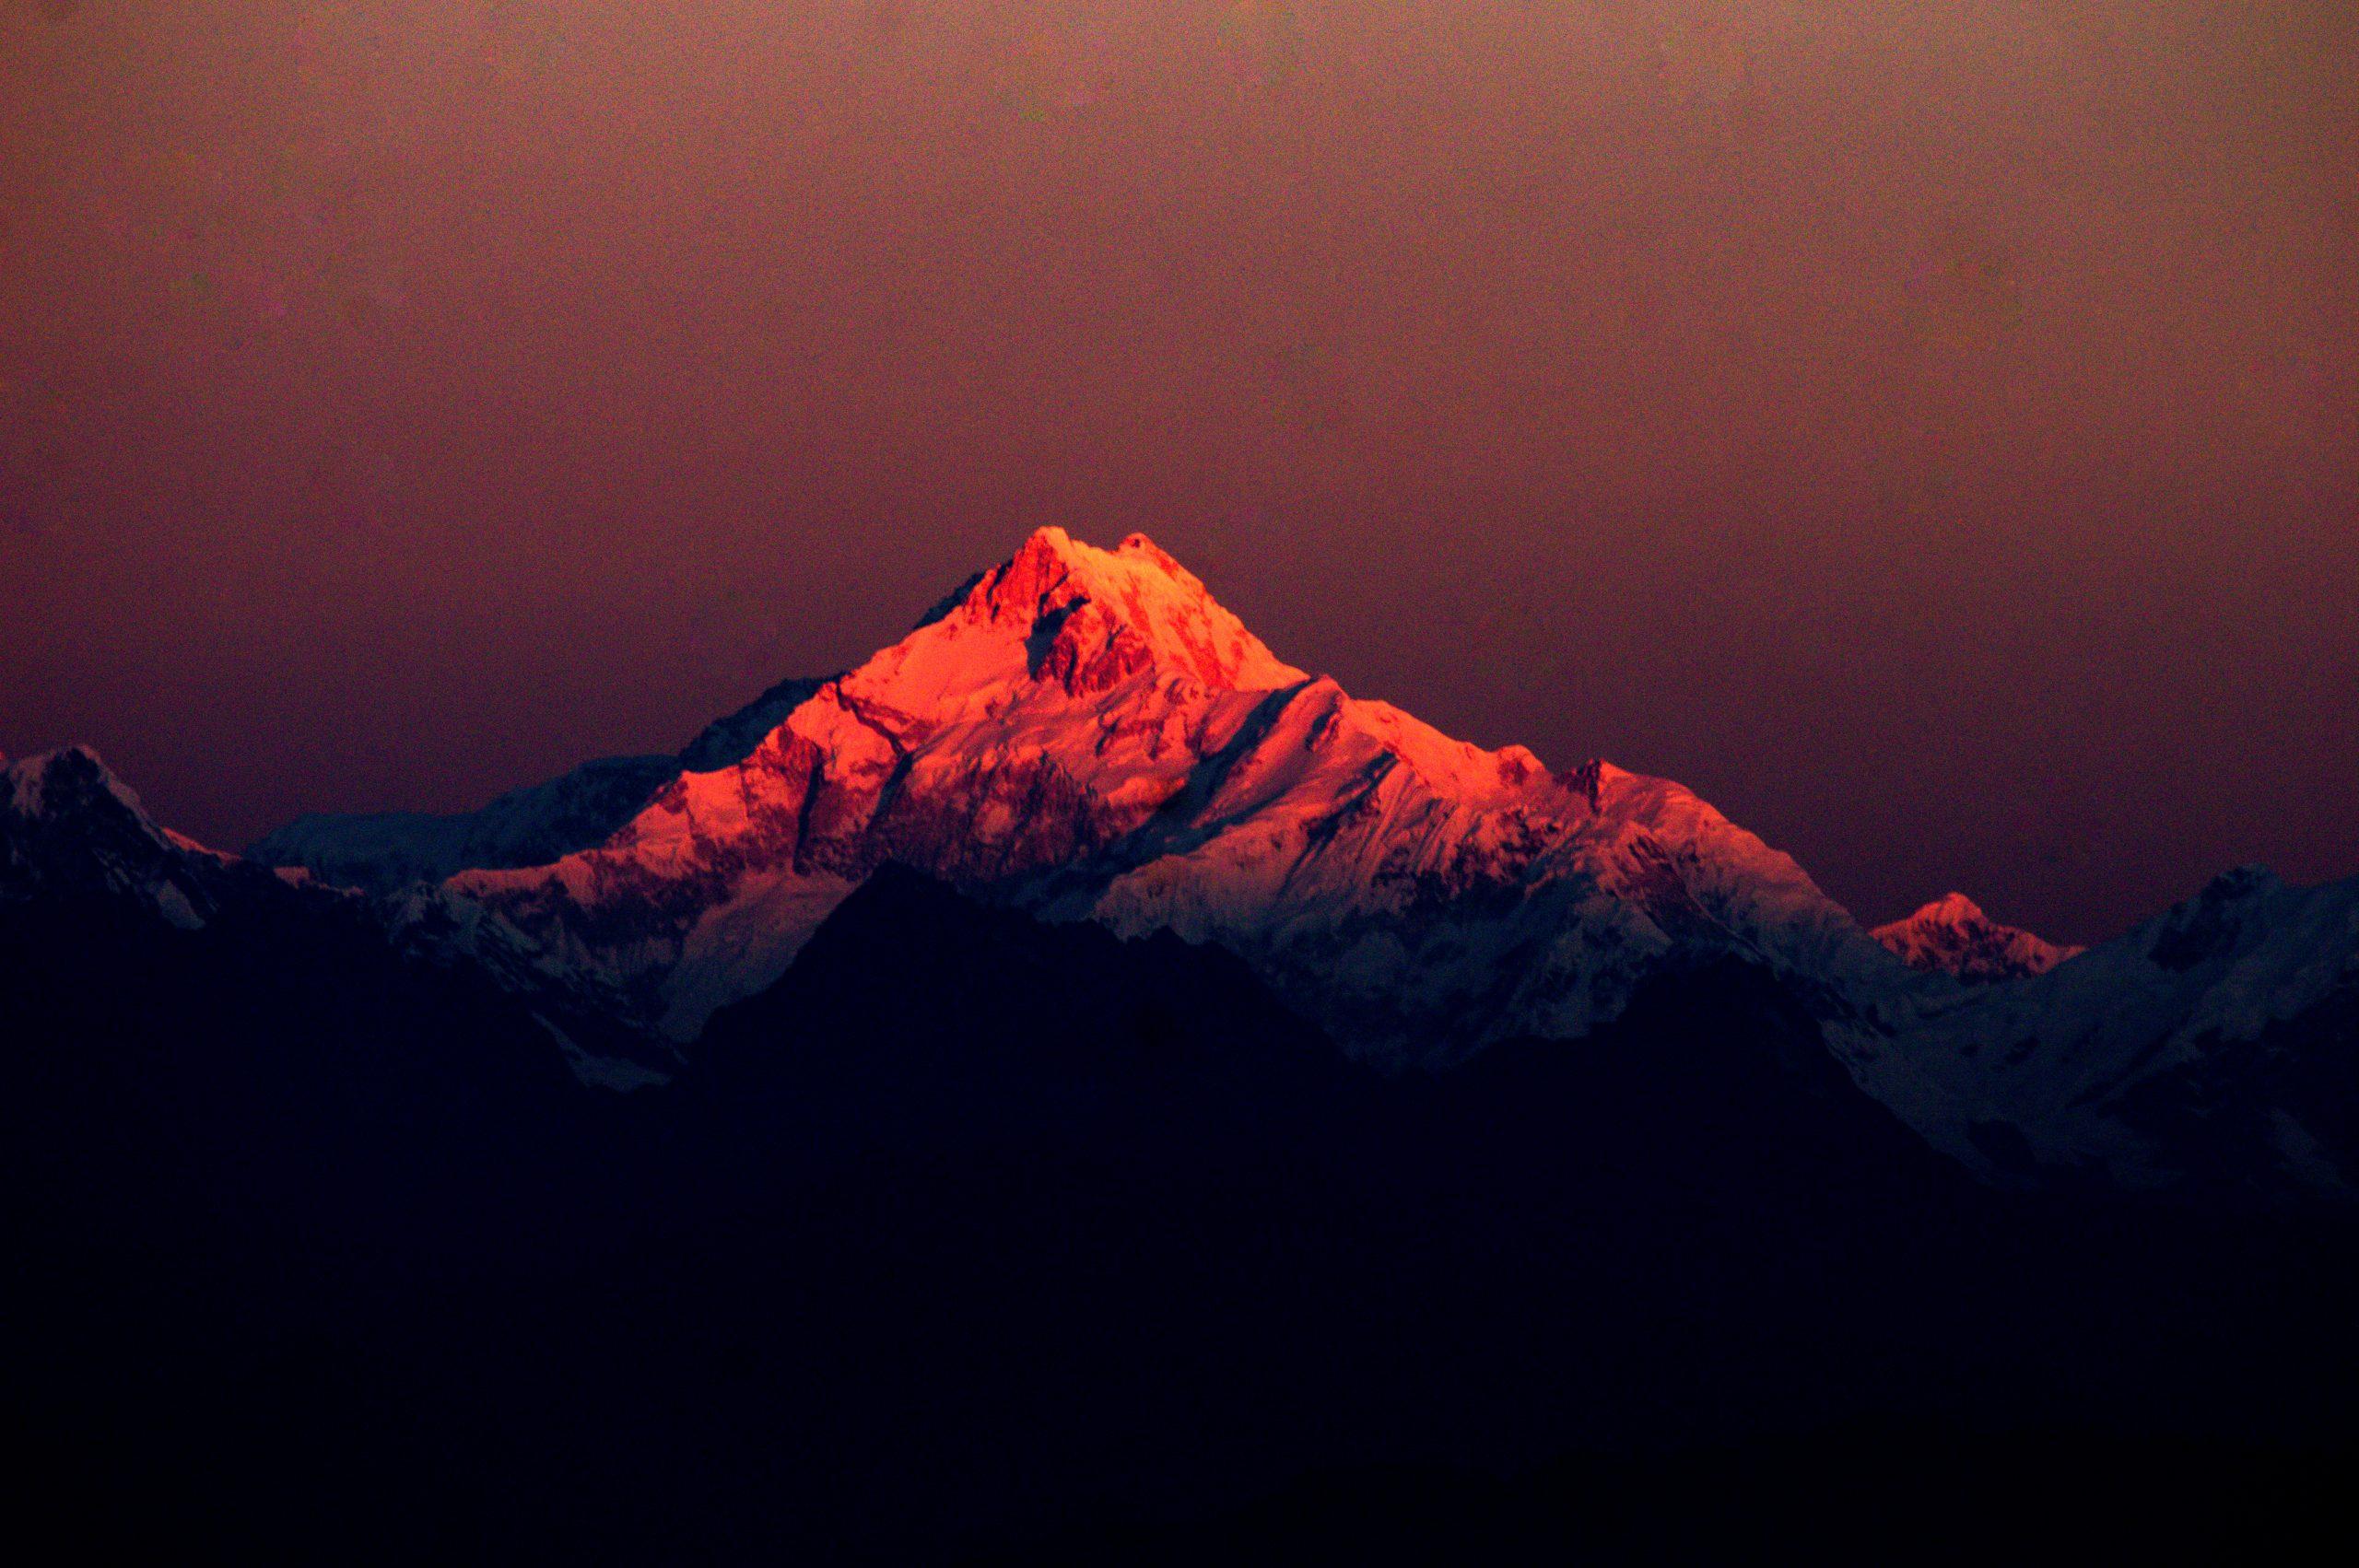 Sunrise on Kanchenjungha, Mankhim, East Sikkim